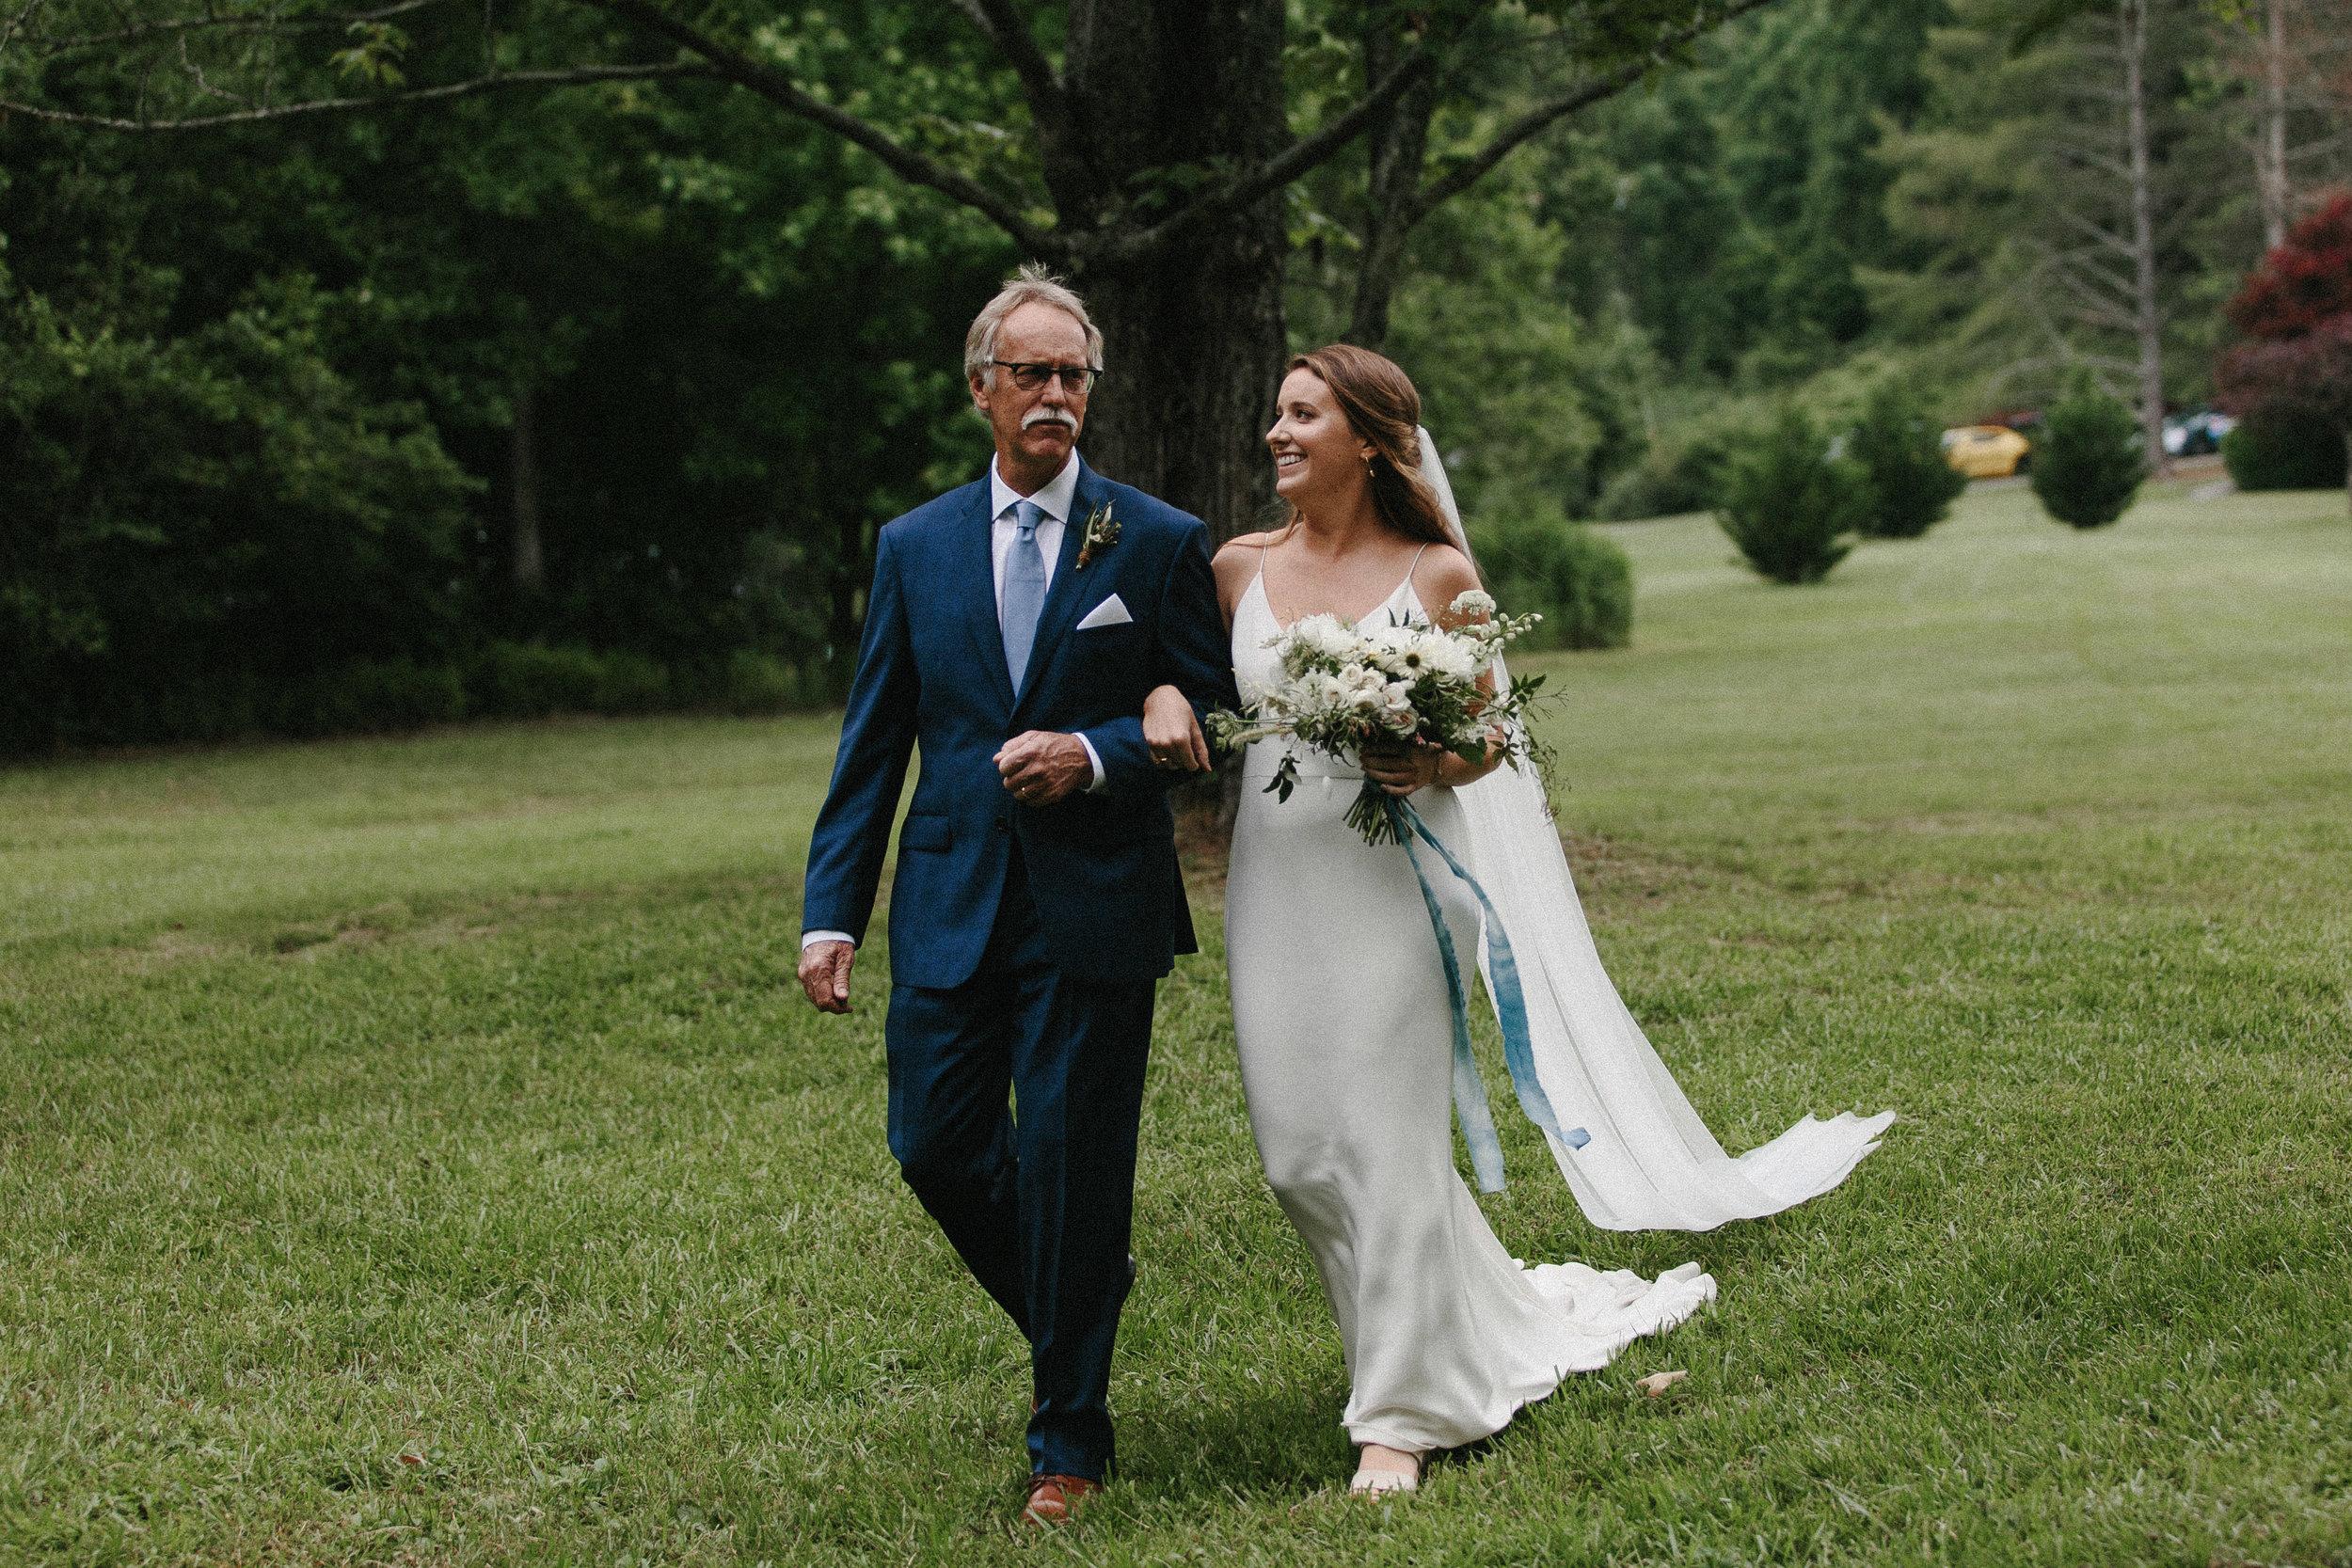 glen_ella_meadow_creekside_atlanta_wedding_photographers_1675.jpg